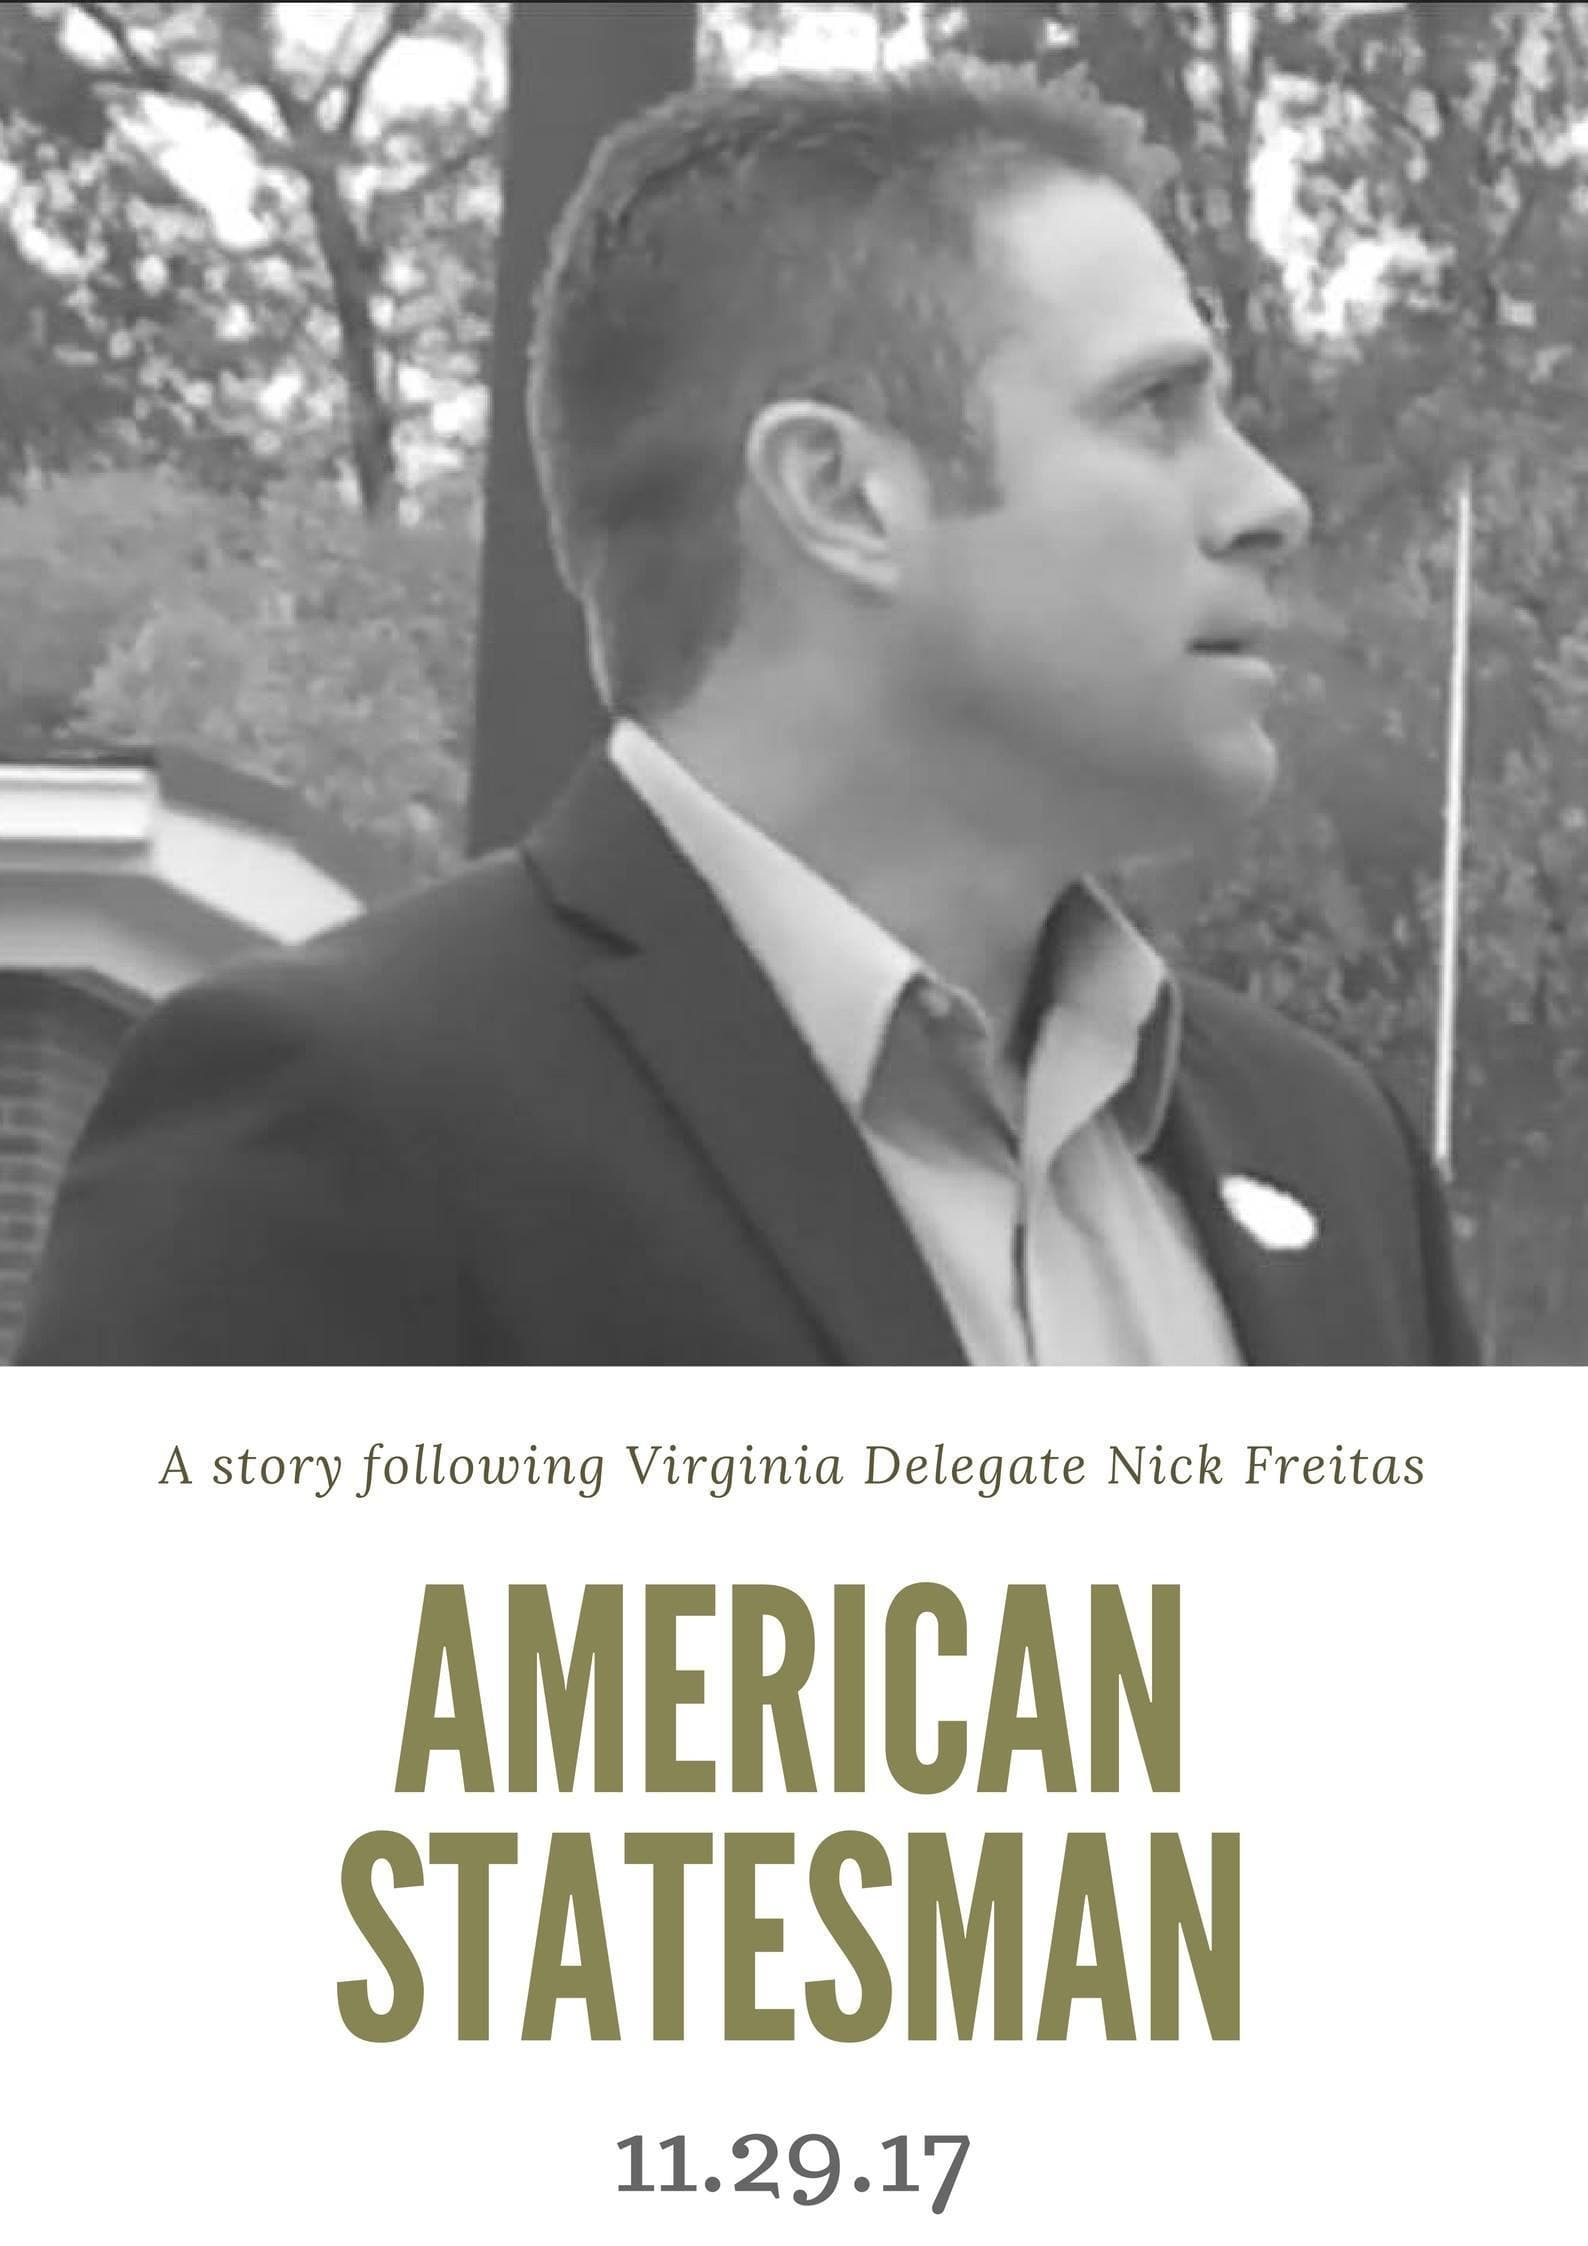 American Statesman: The Nick Freitas Story (2017)